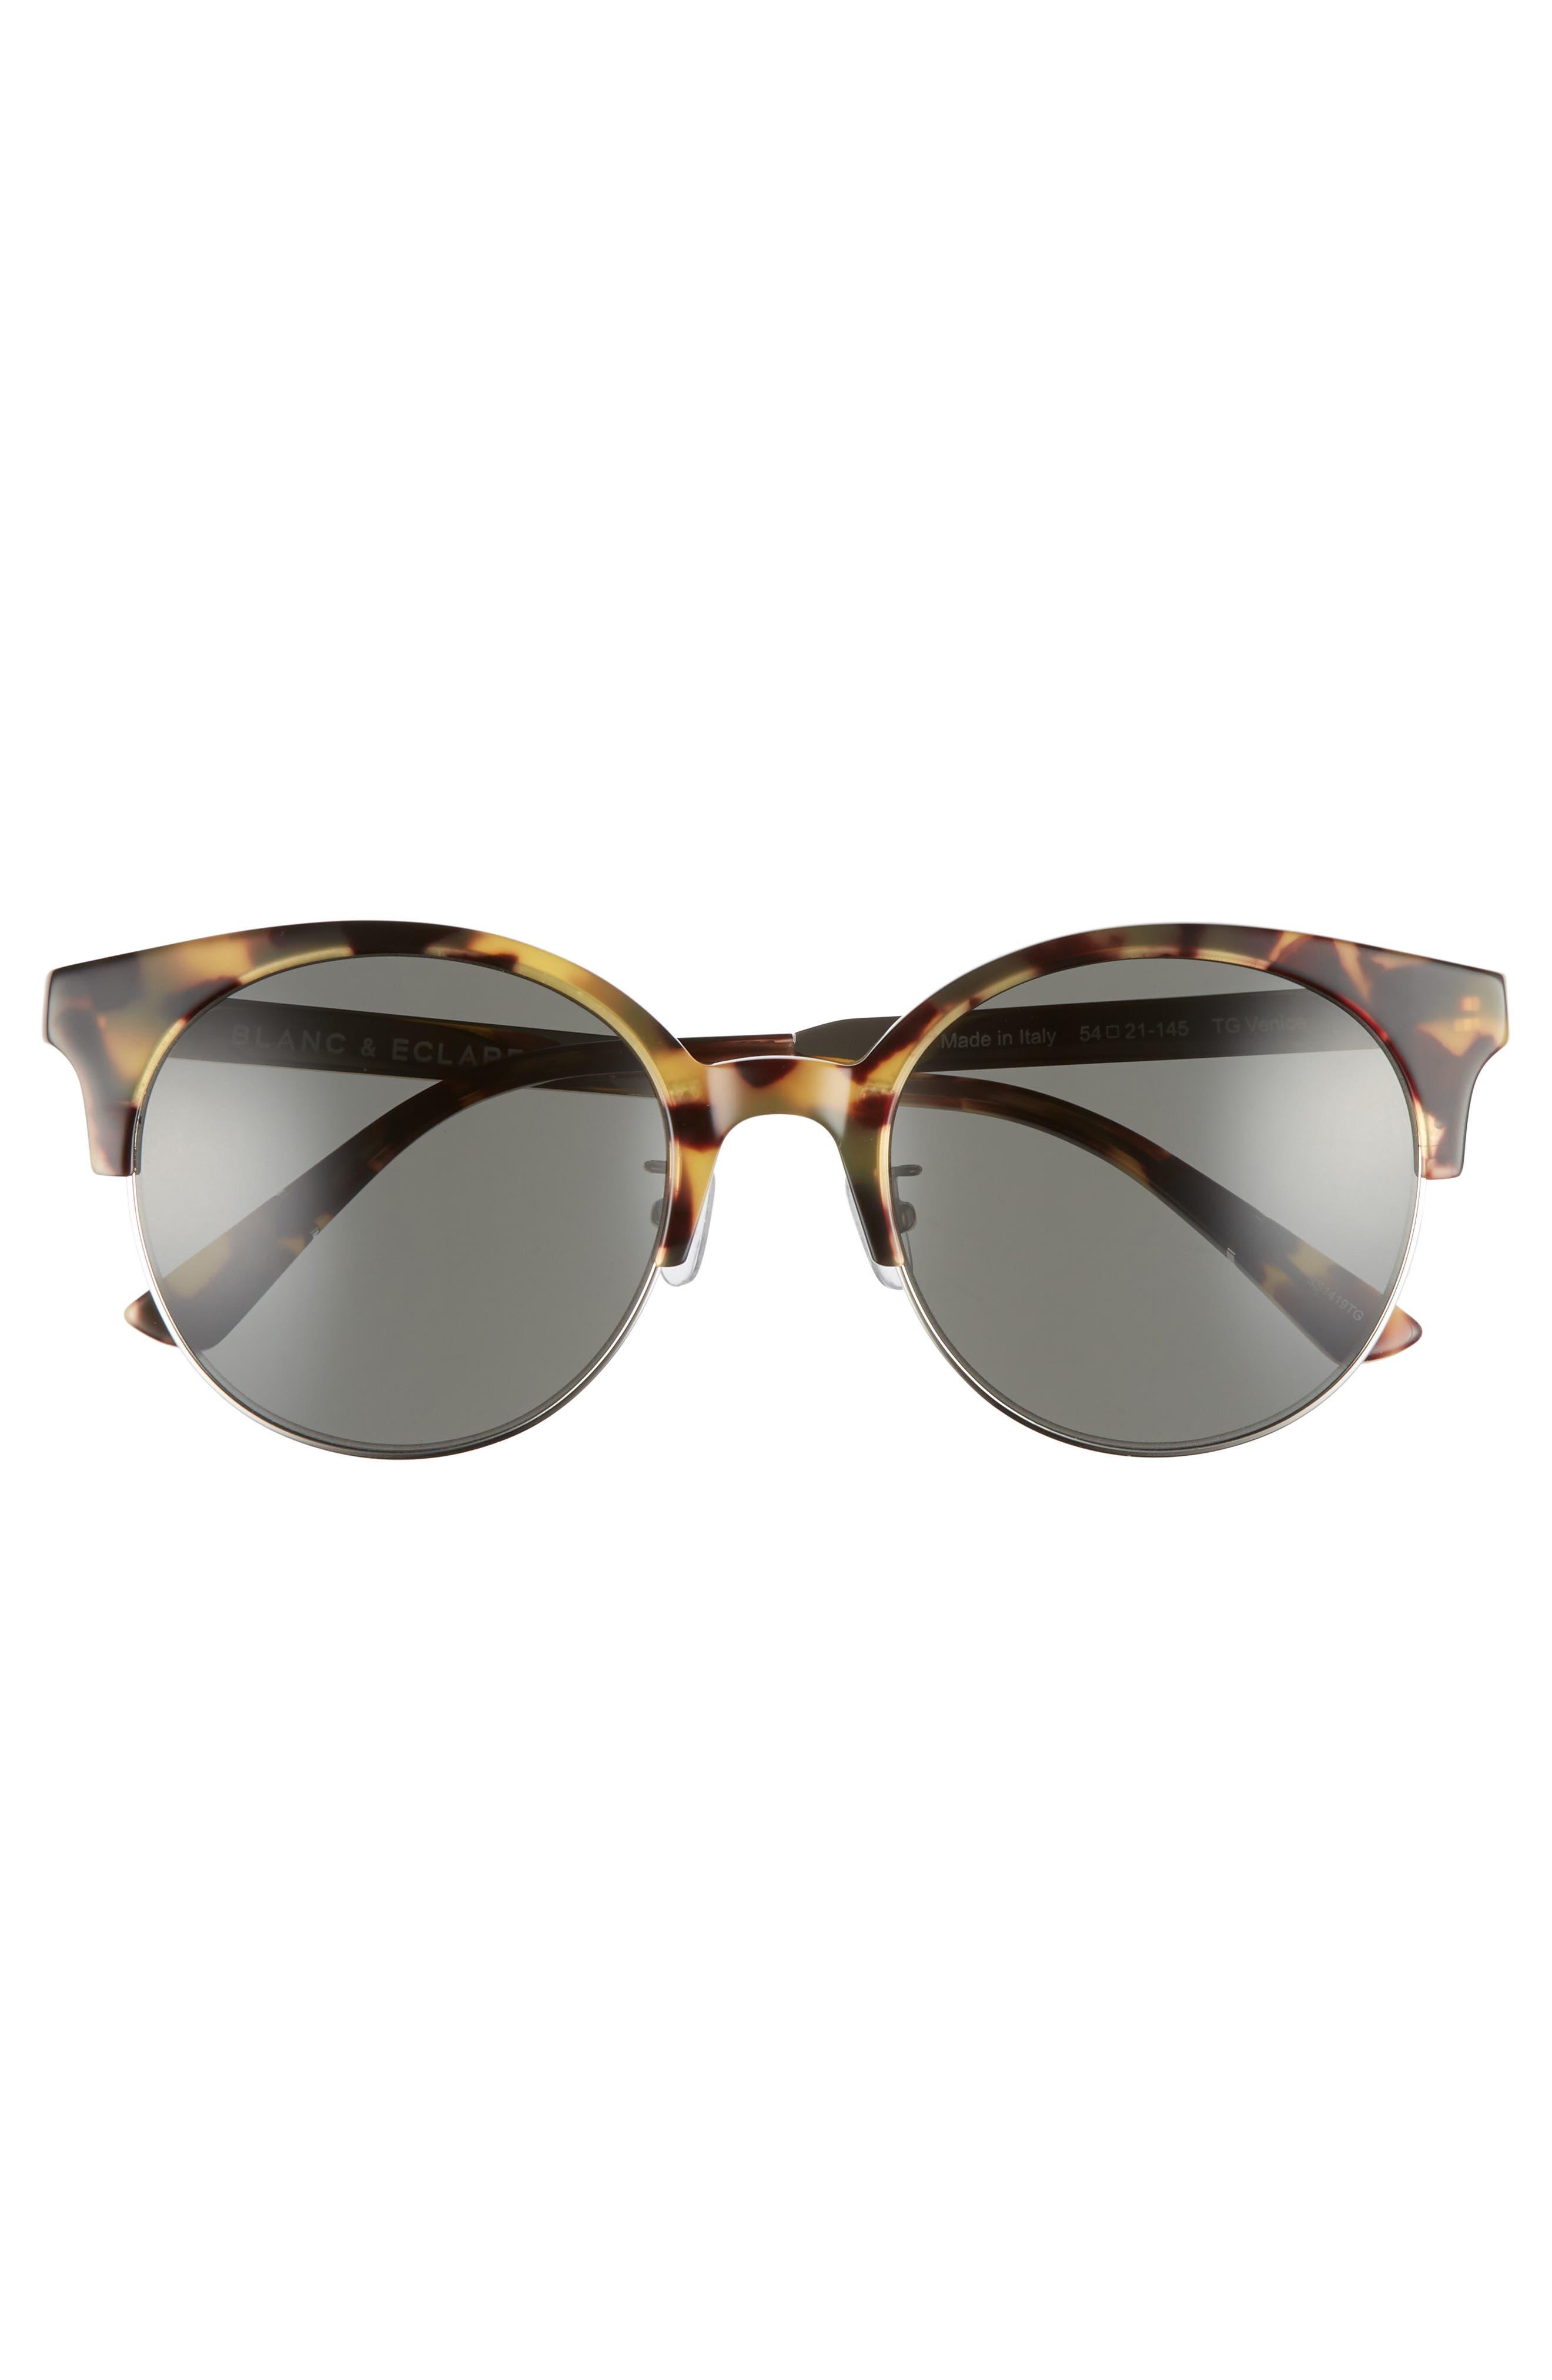 BLANC & ECLARE Venice Round Sunglasses,                             Alternate thumbnail 6, color,